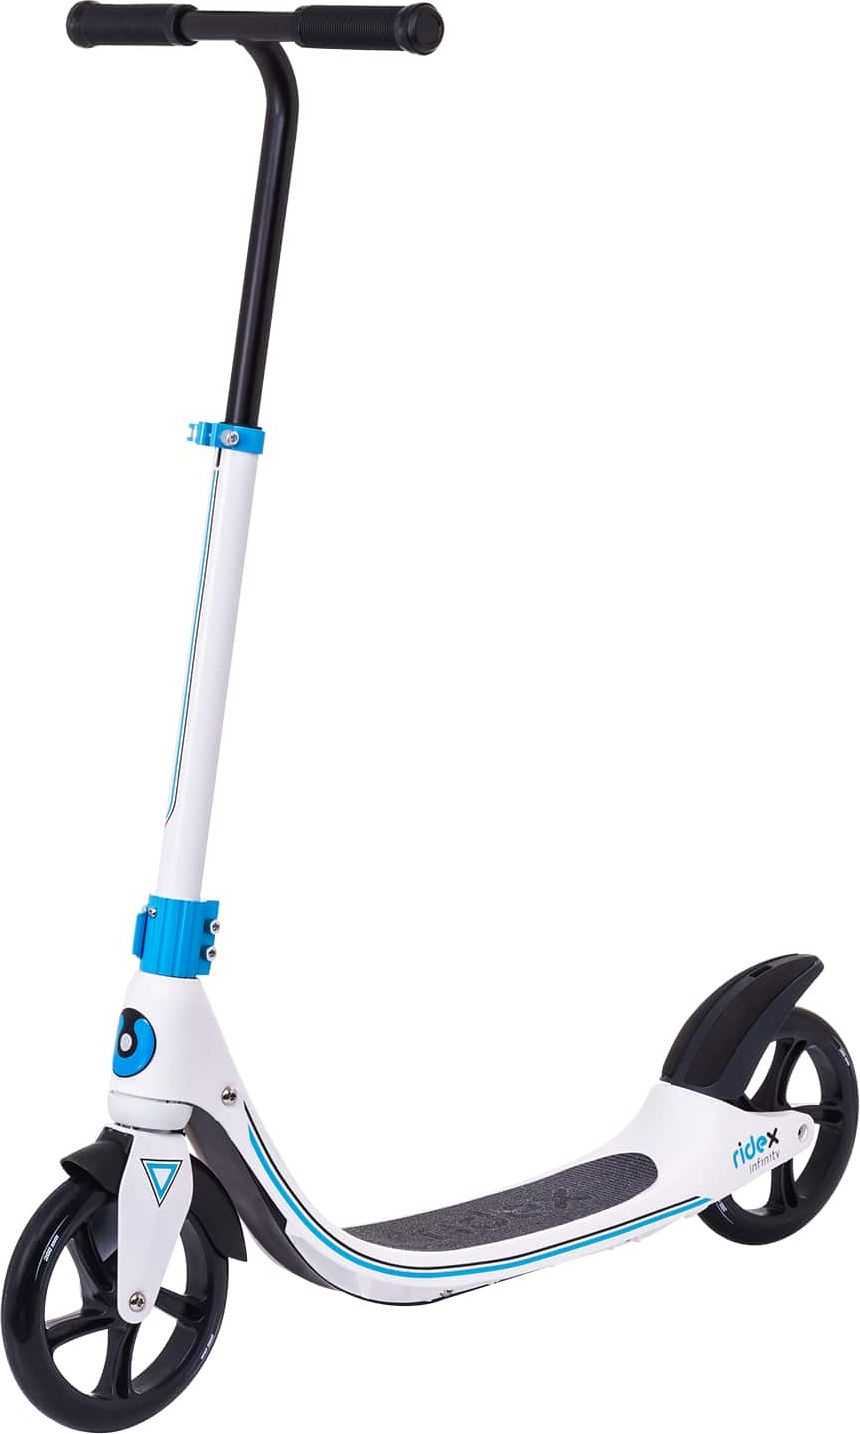 Самокат Ridex Infinity, 2-х колесный, колеса 200 мм, цвет: белый двухколесные самокаты ridex eclipse 230 200 мм